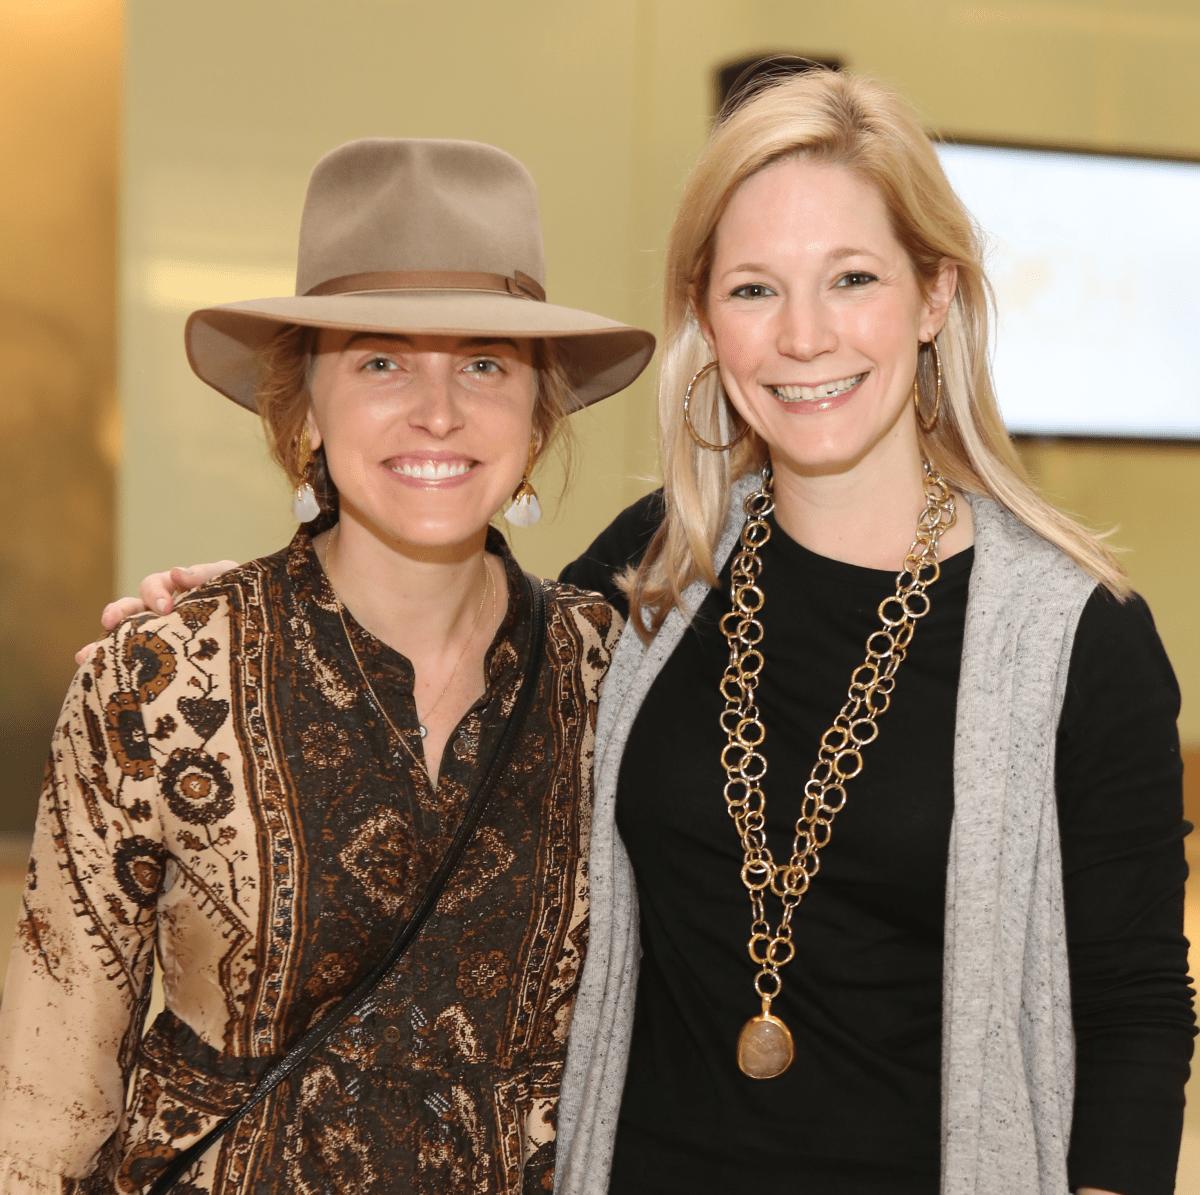 News, Shelby, Decorative Center Houston Fall Market, Nov. 2015, Elise Johnson, Rebecca Tripplehorn